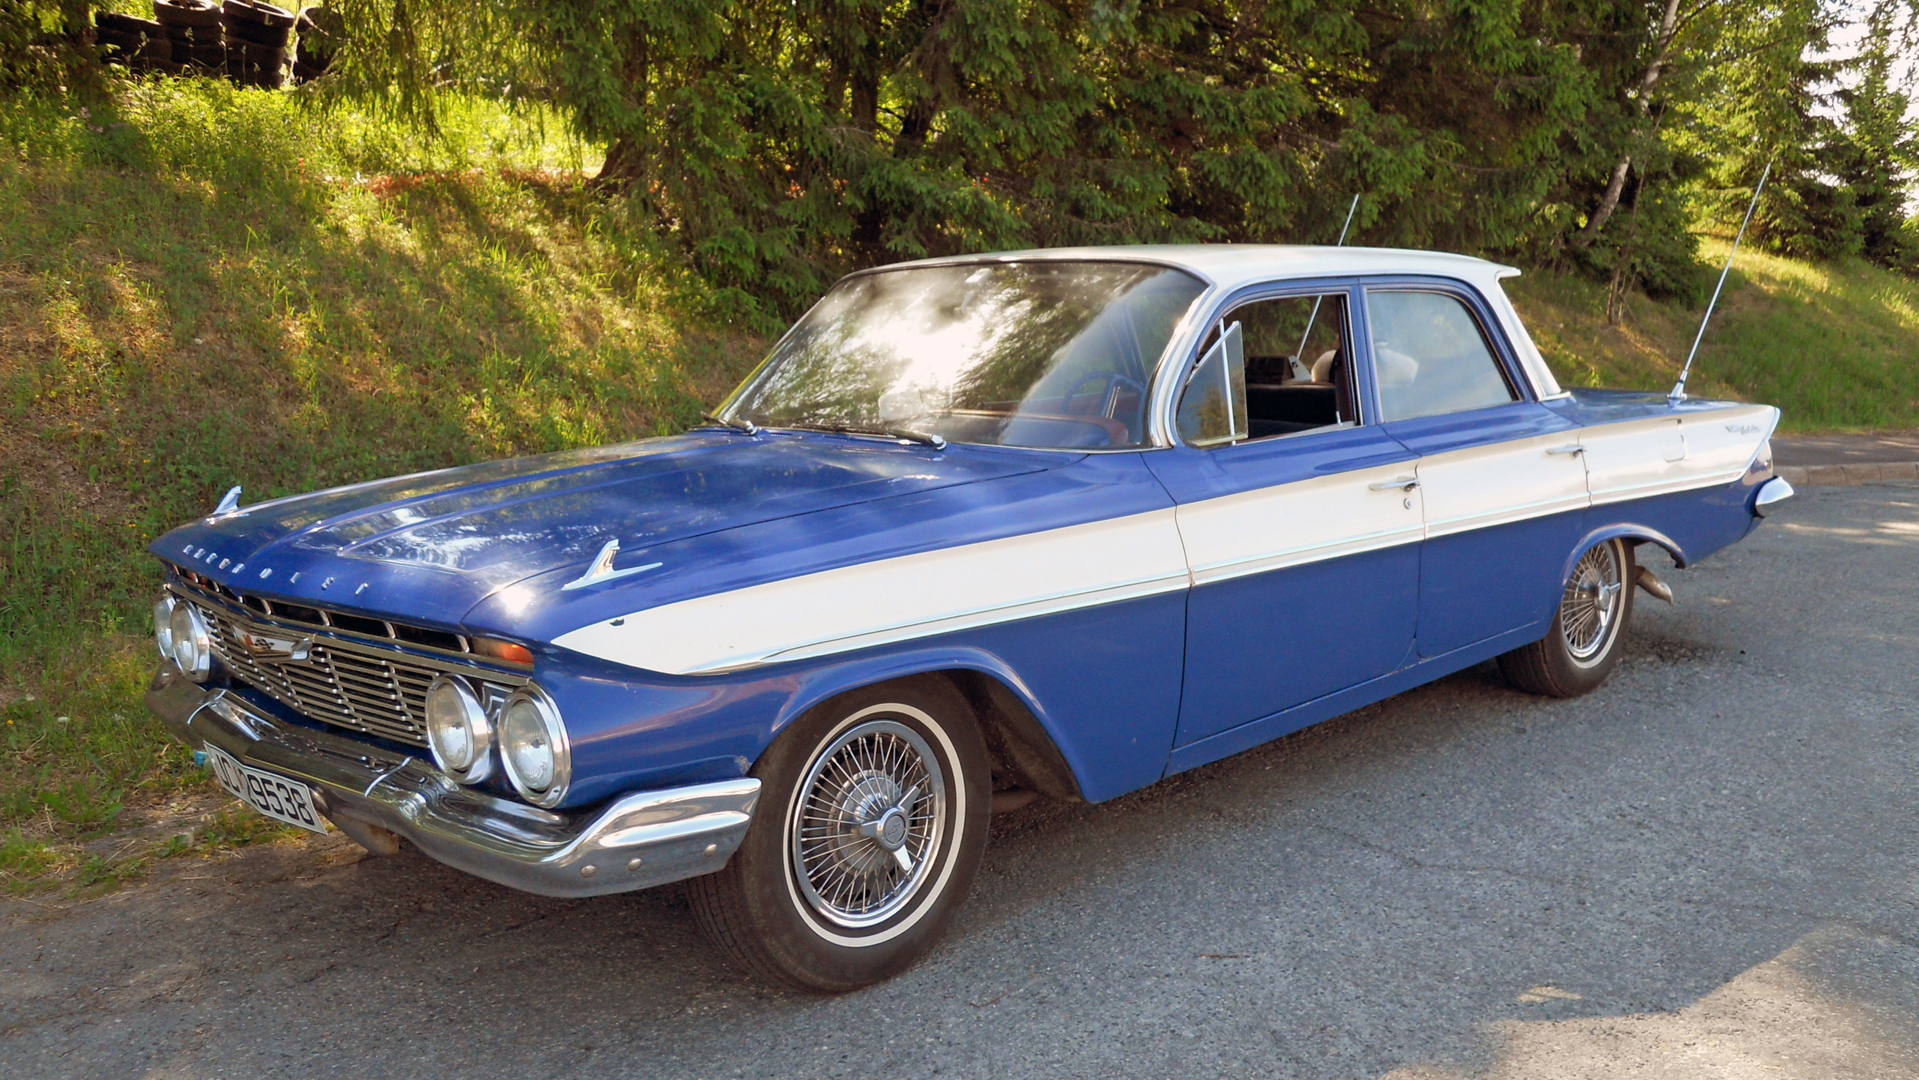 131-1961 Chevrolet Bel Air 01. Eier- medlem 131 Fa